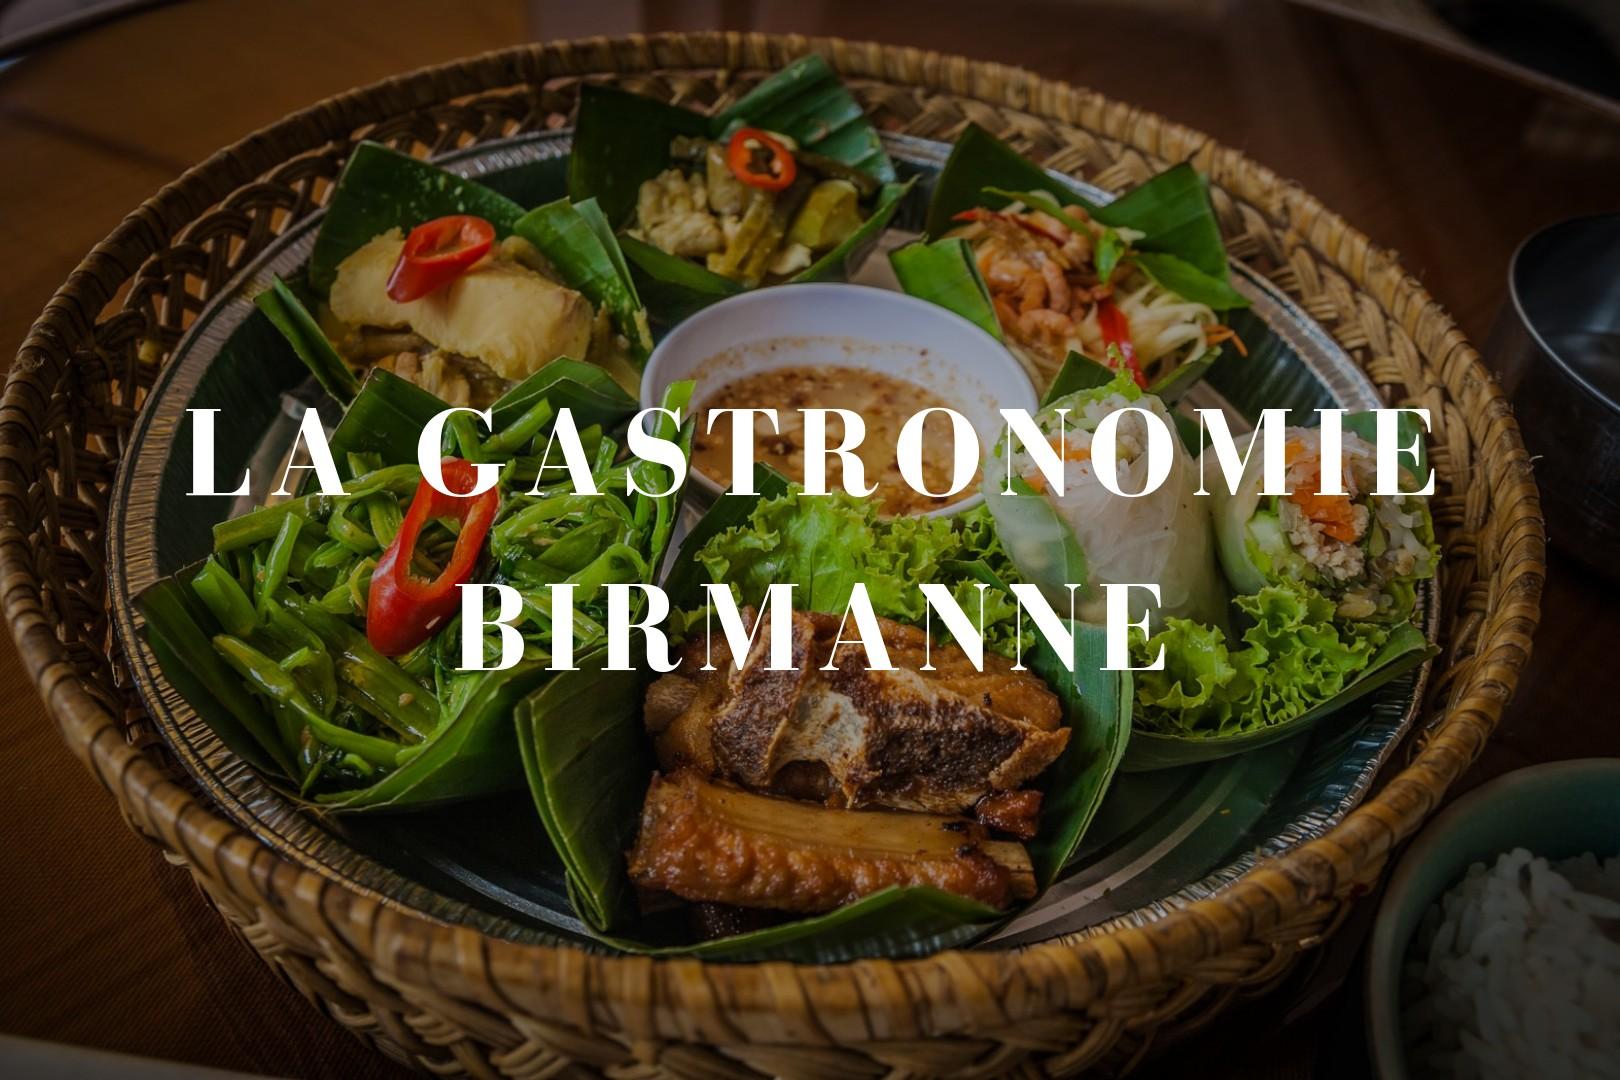 La gastronomie birmanne